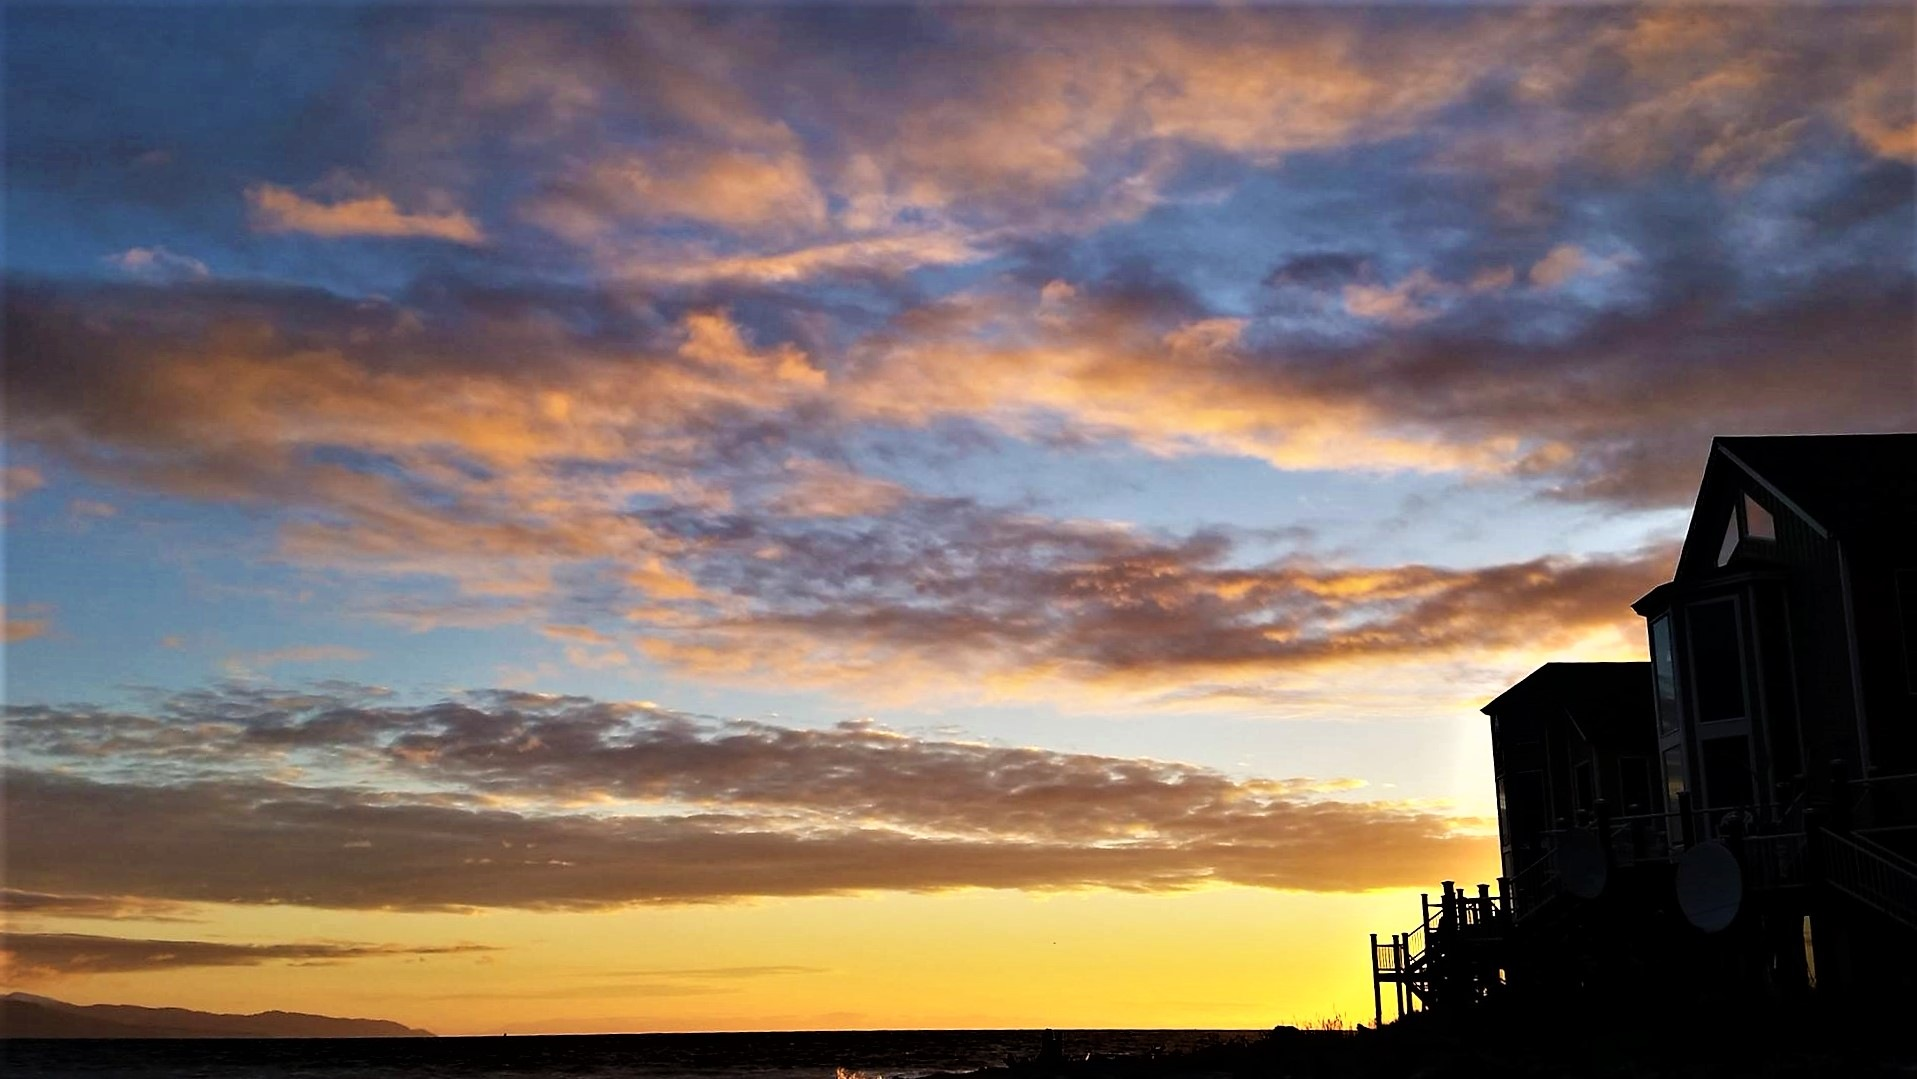 Sunset in Homer, Alaska by teresa.thiele1